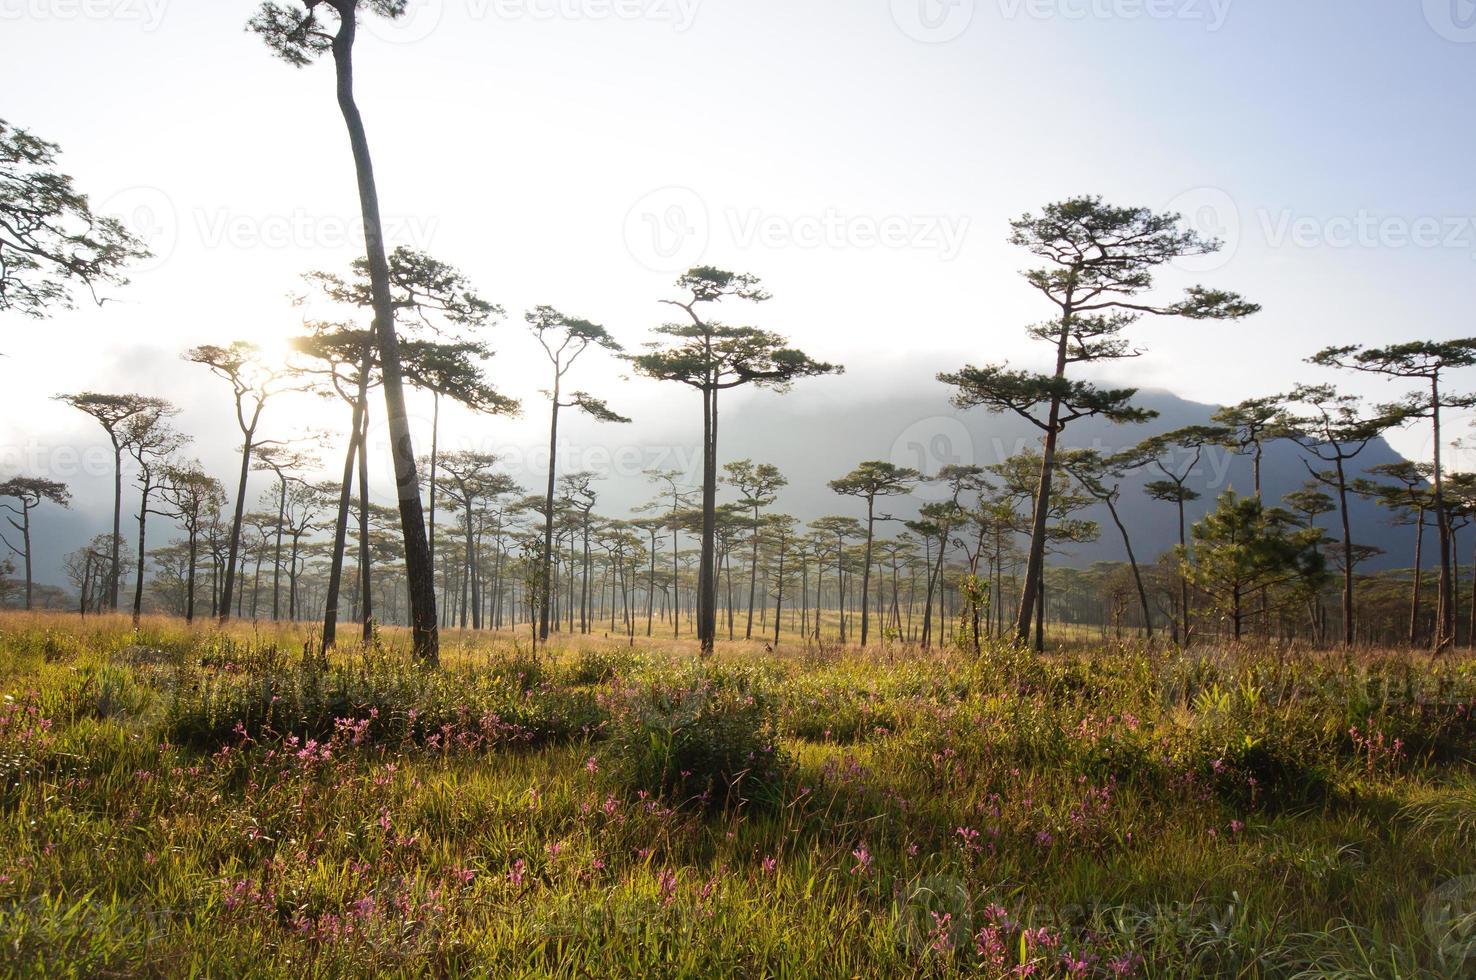 dennenbos bij phusoidao berg in Thailand foto